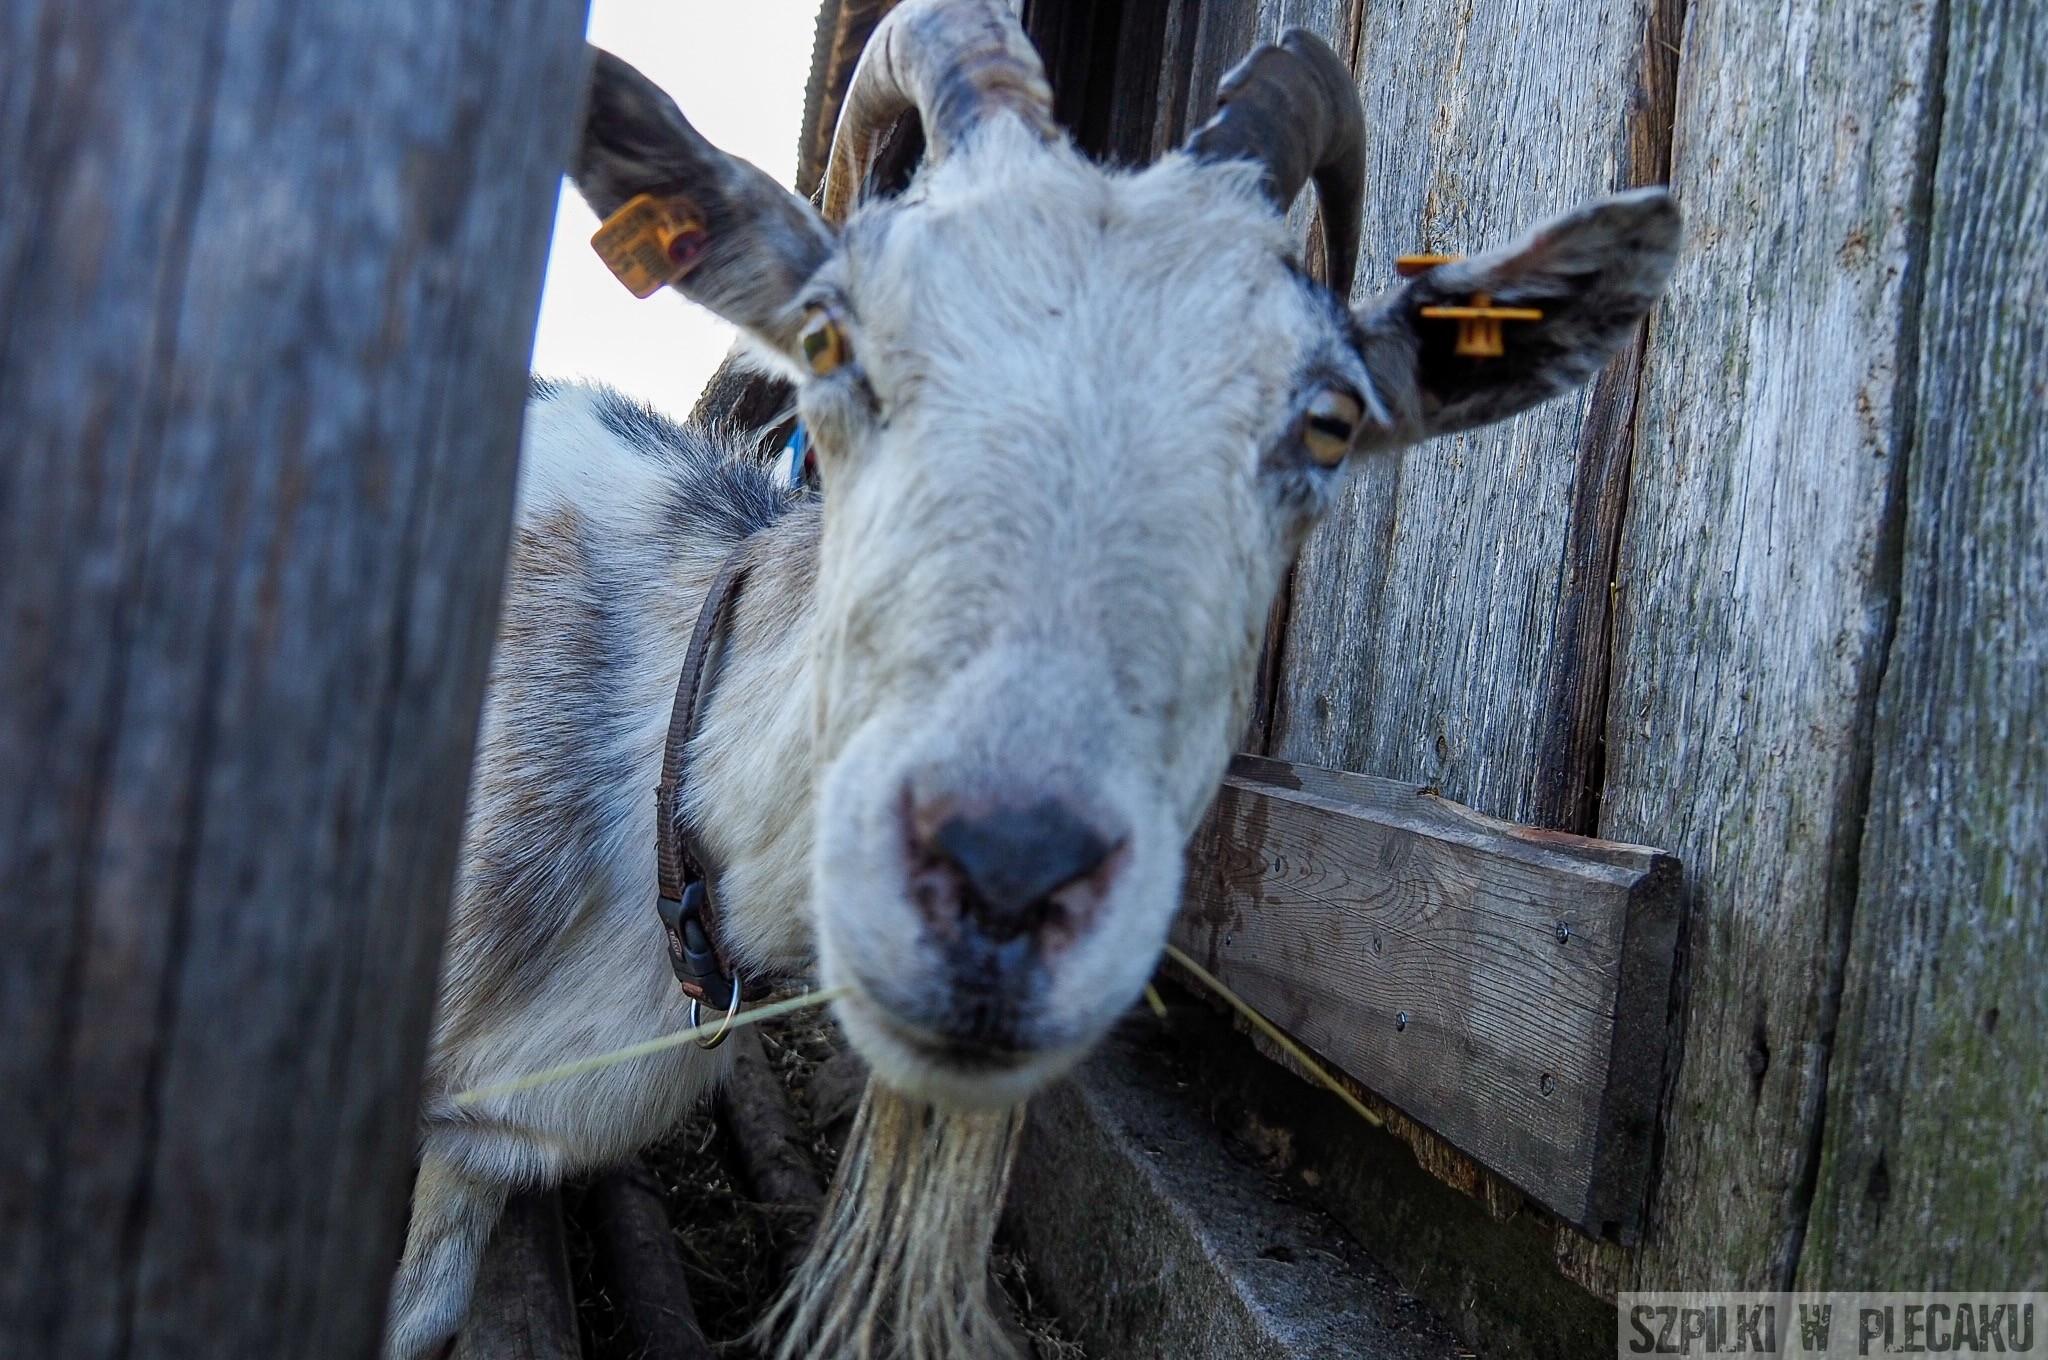 Funny goat - Siedlisko Leluja